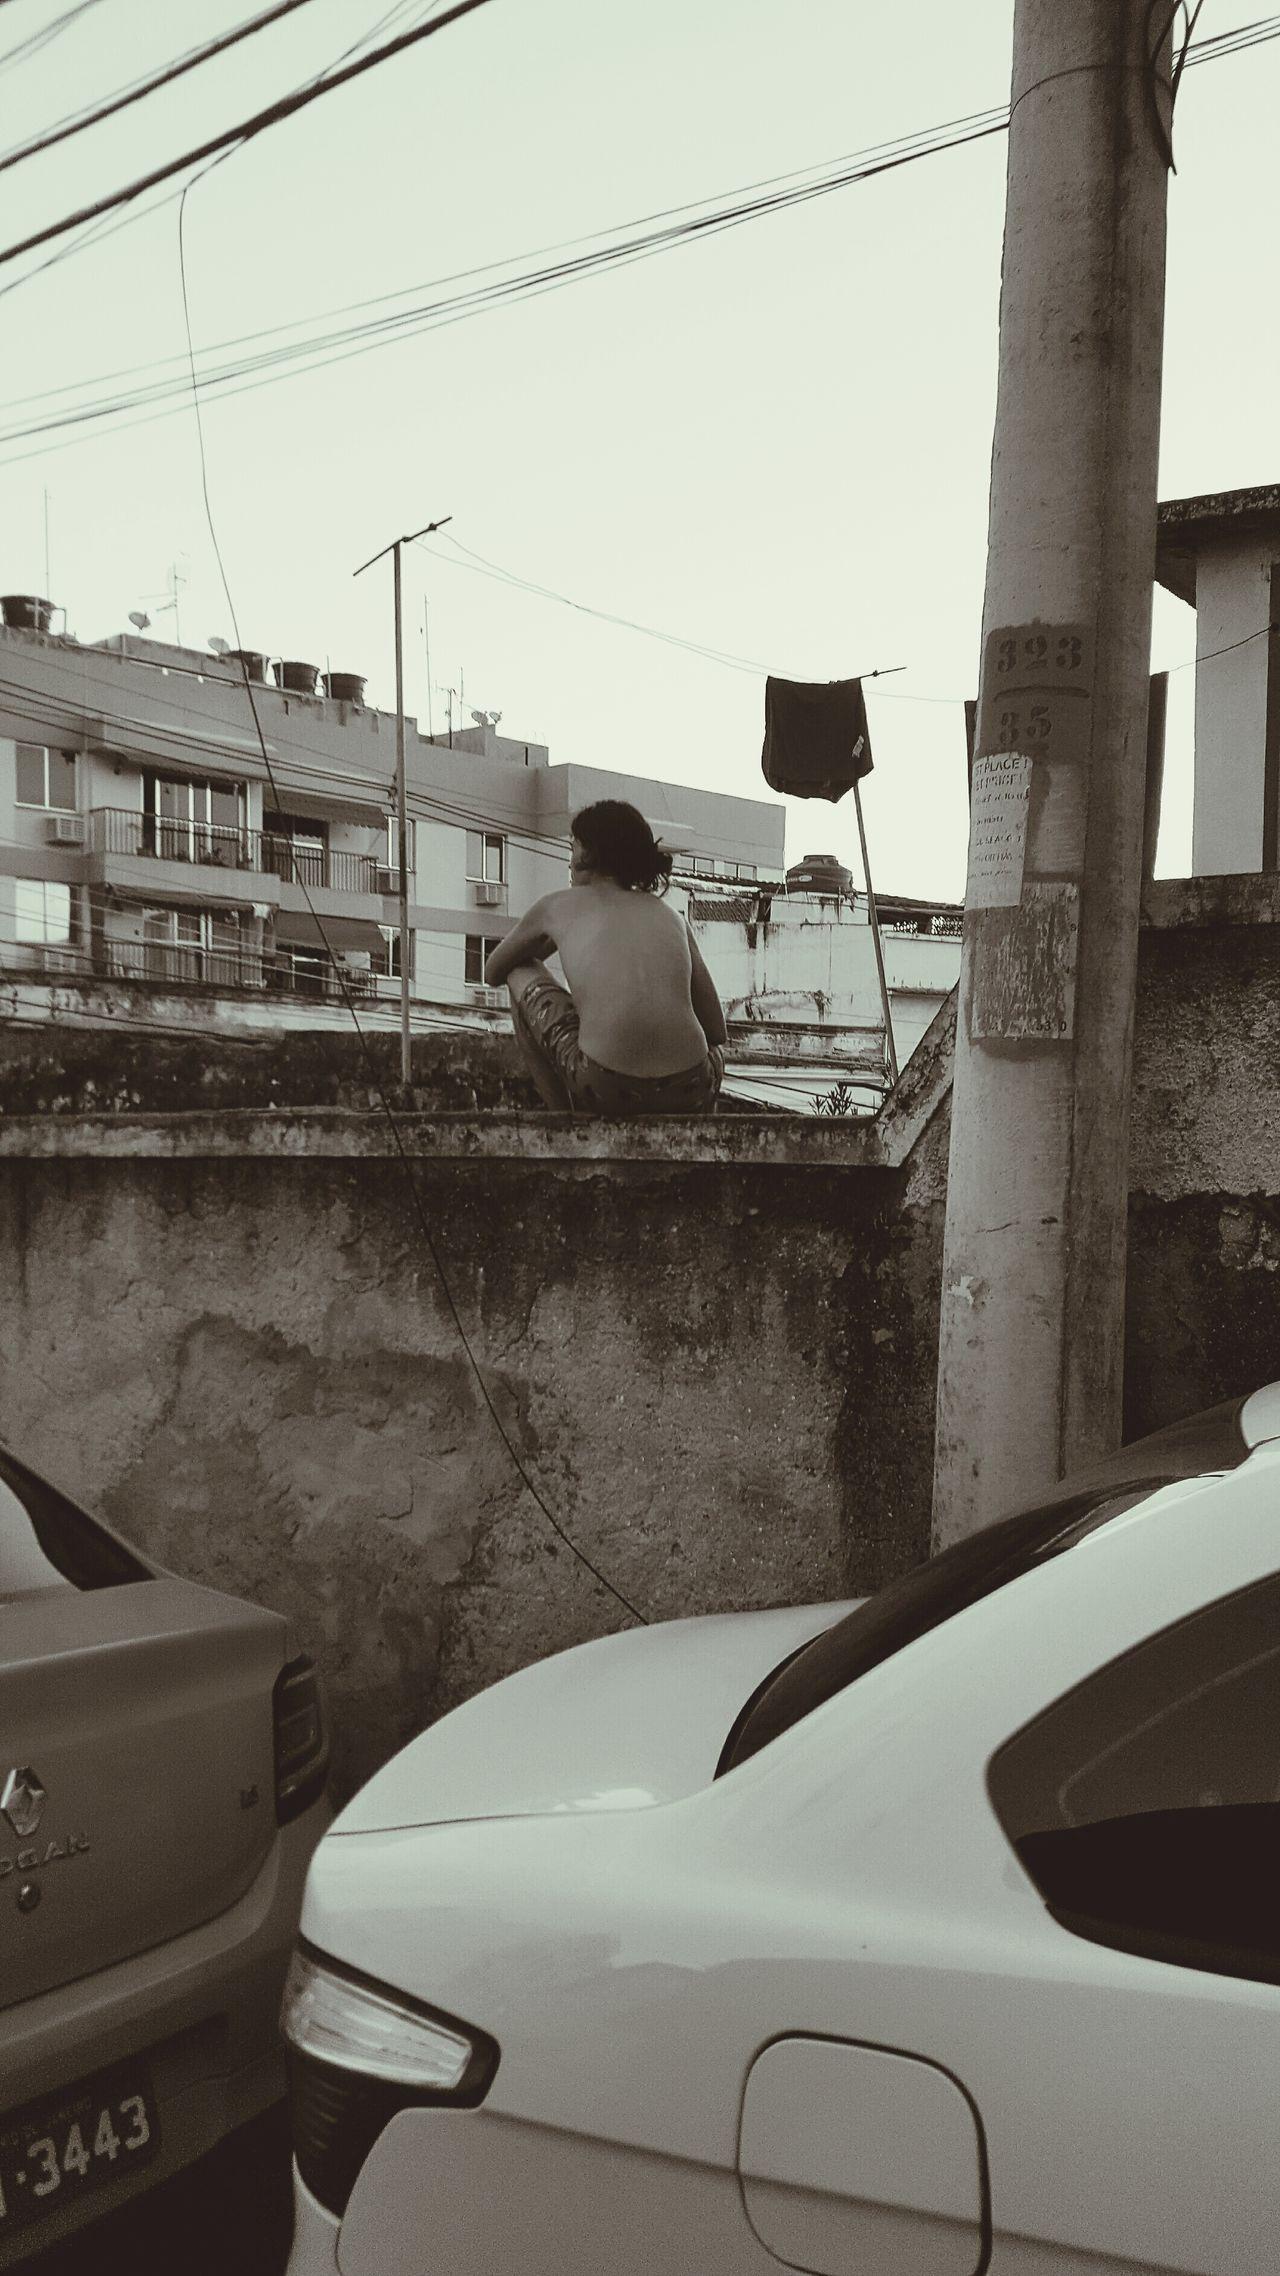 Watching Favela Rio De Janeiro Brazil Poverty Struggle Black And White Wall Sitting Man Hope Dreaming